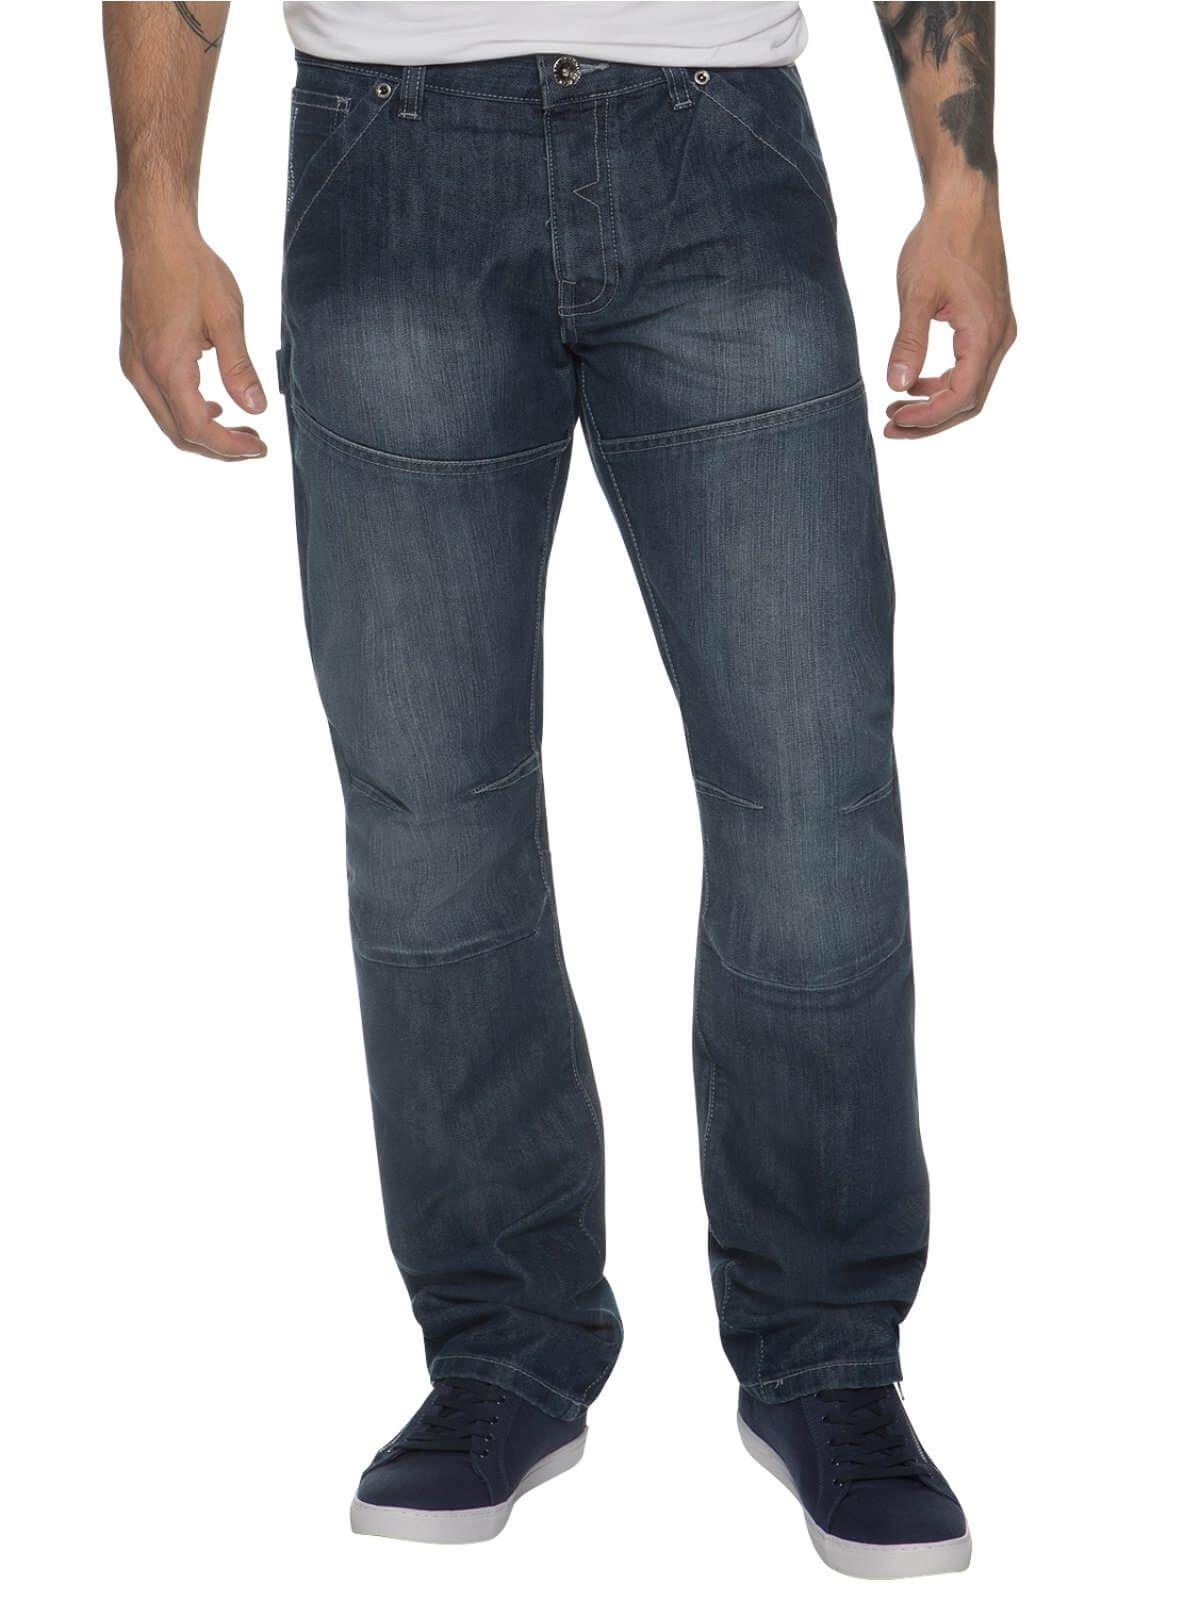 Mens Midwash Straight Fit Denim Jeans EZ243 | Enzo Designer Menswear